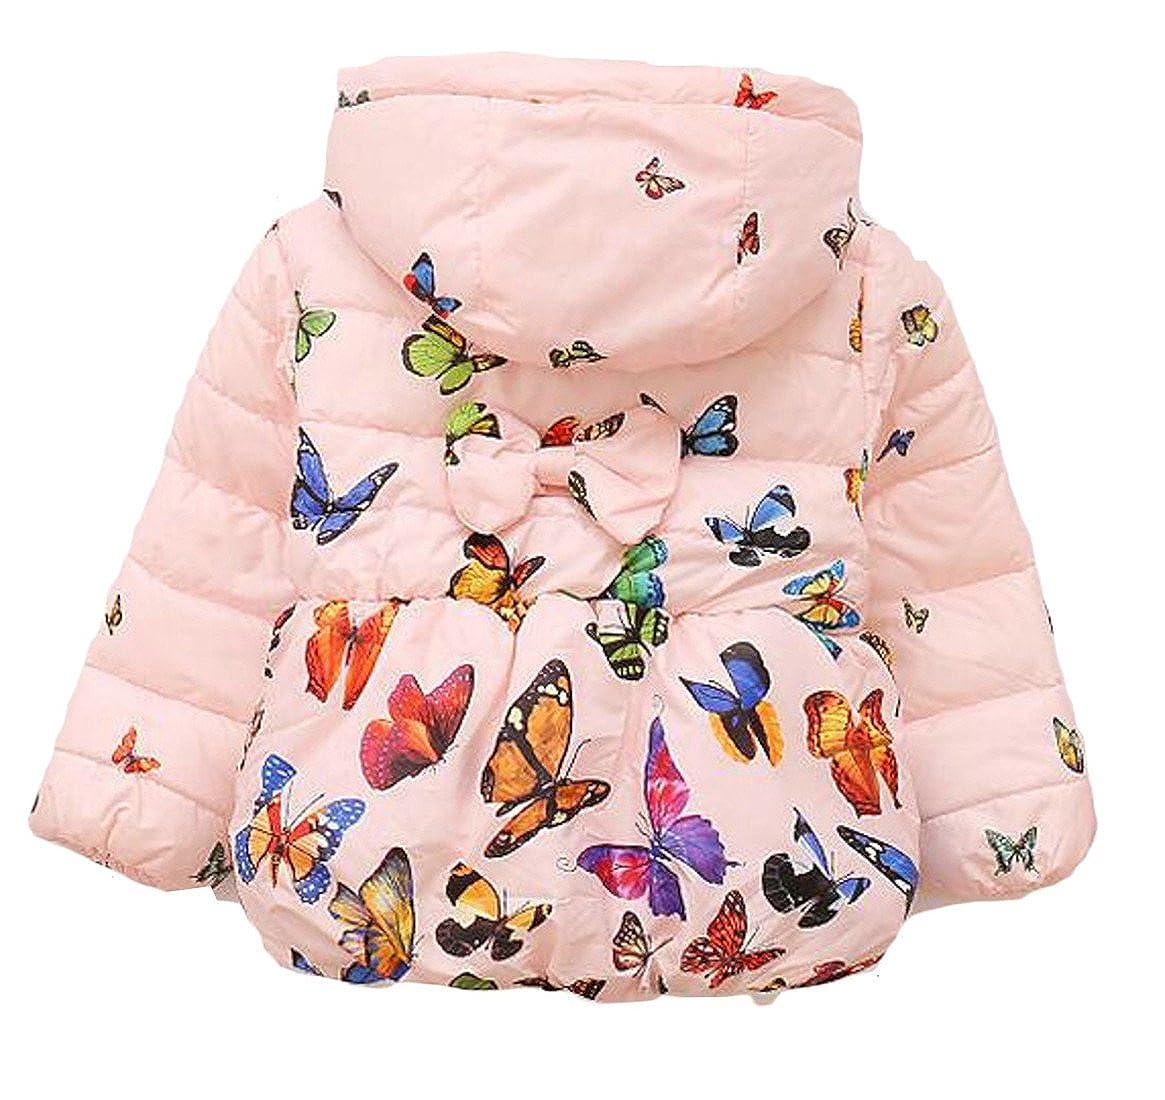 Sweatwater Girls Fashion Bubble Hooded Butterfly Print Overcoat Jackets Coat